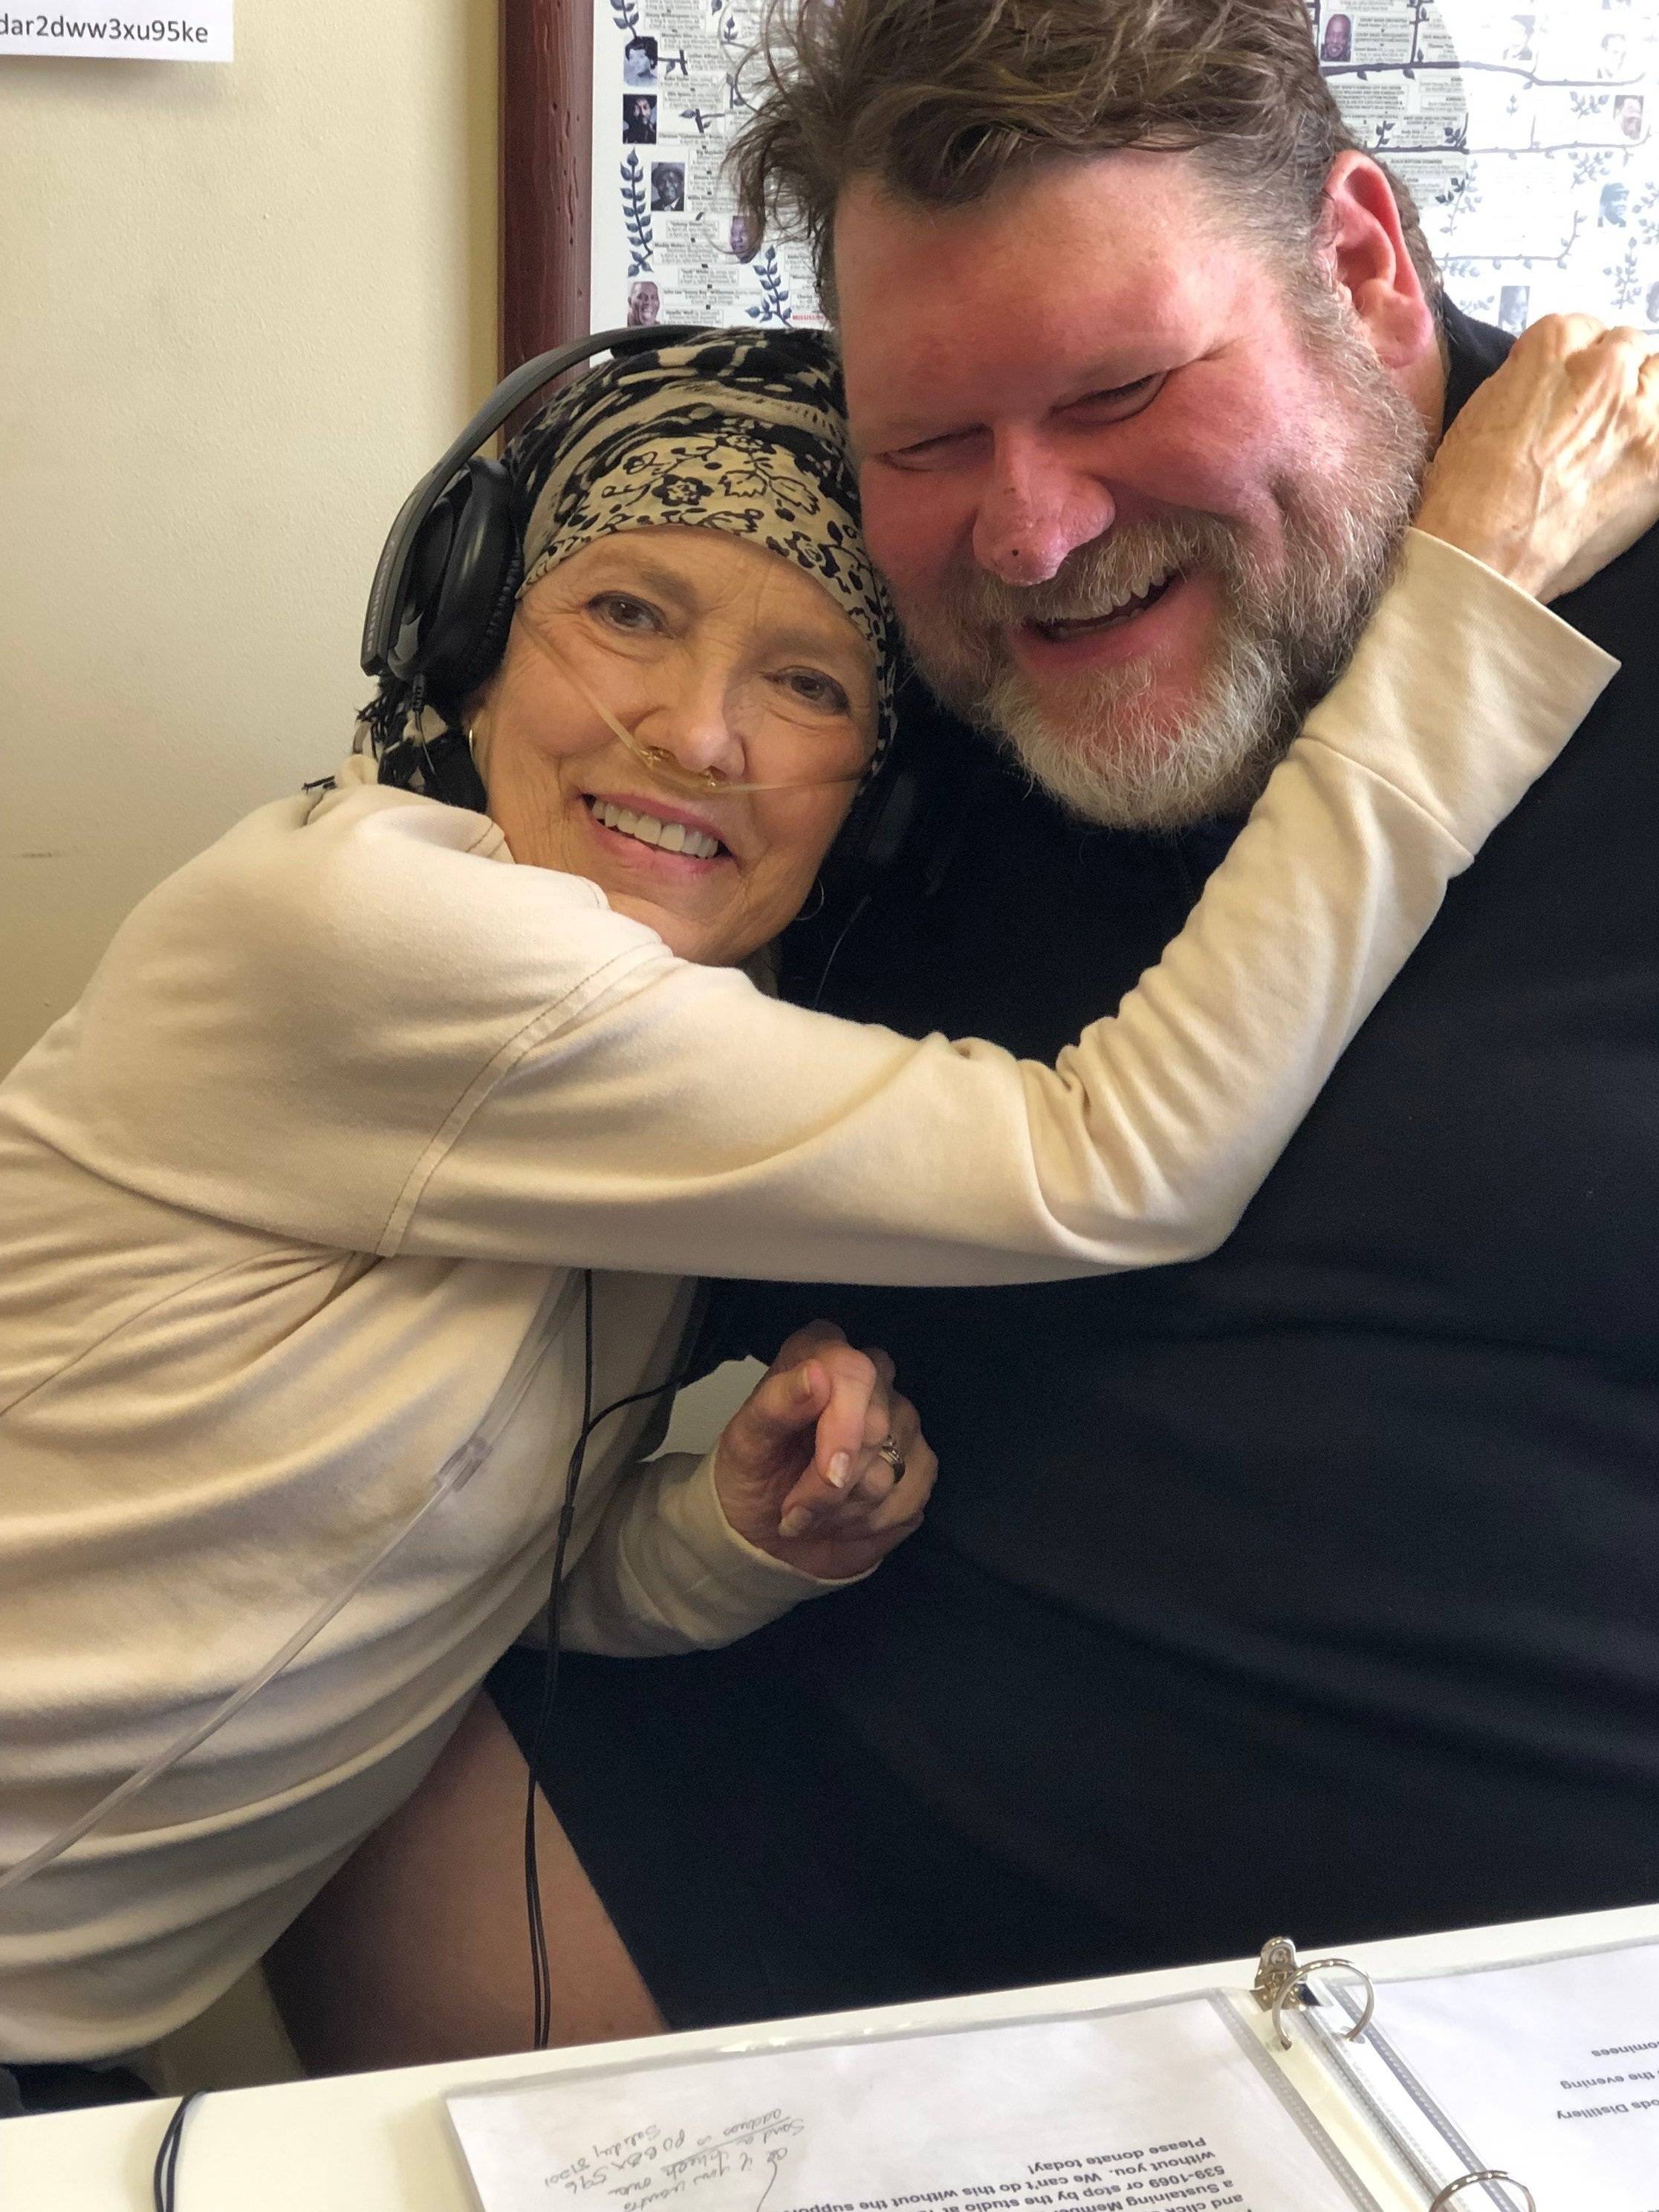 Jane Whitmer, Top 5 Women Who Rock giving Jimmy Sellars a big HUG